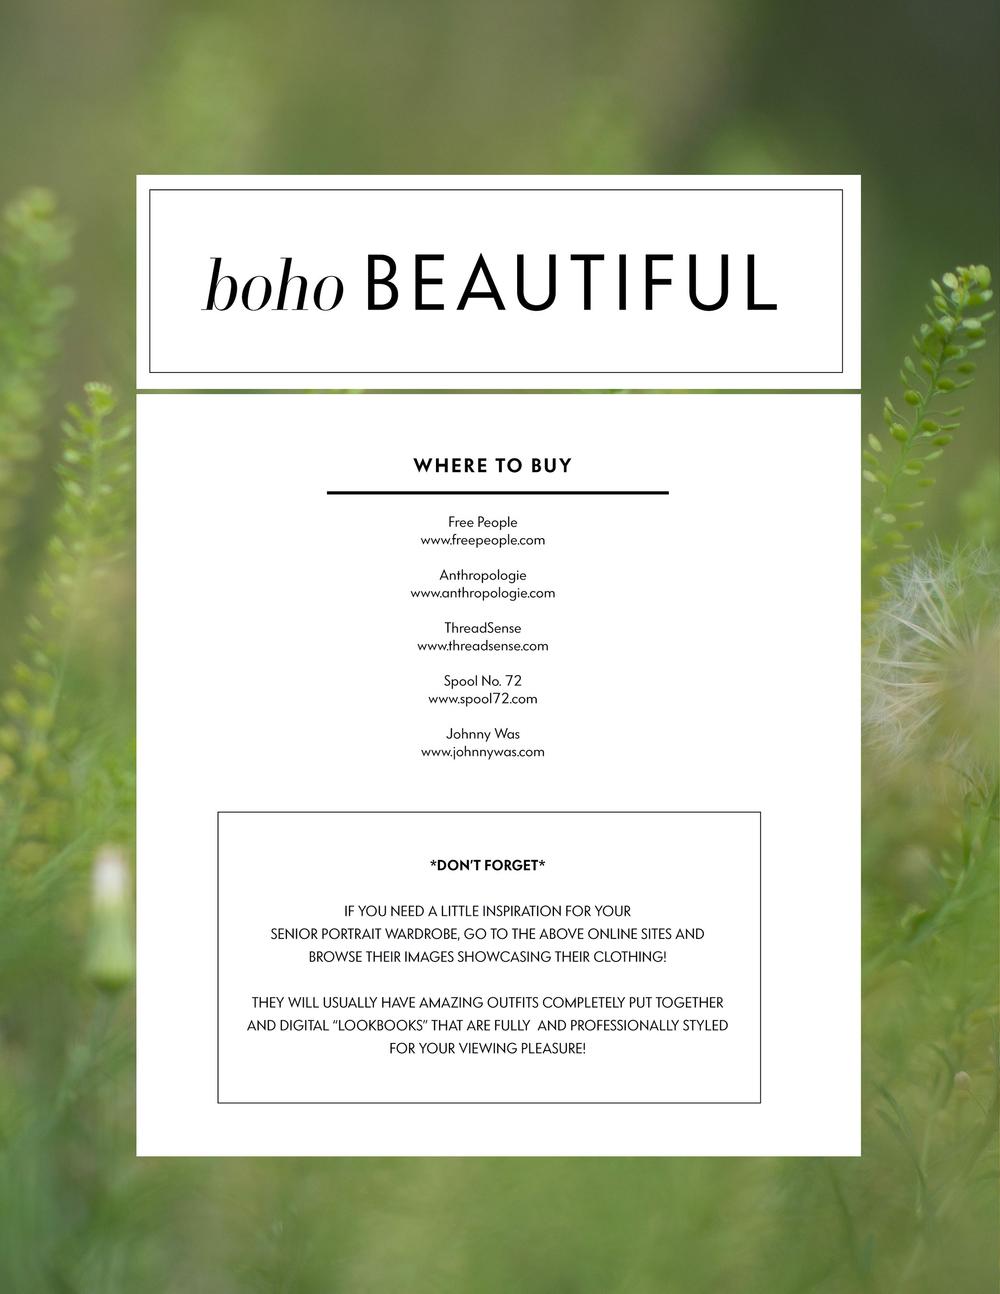 What to Wear Guide - Digital PDF-31-Left.jpg